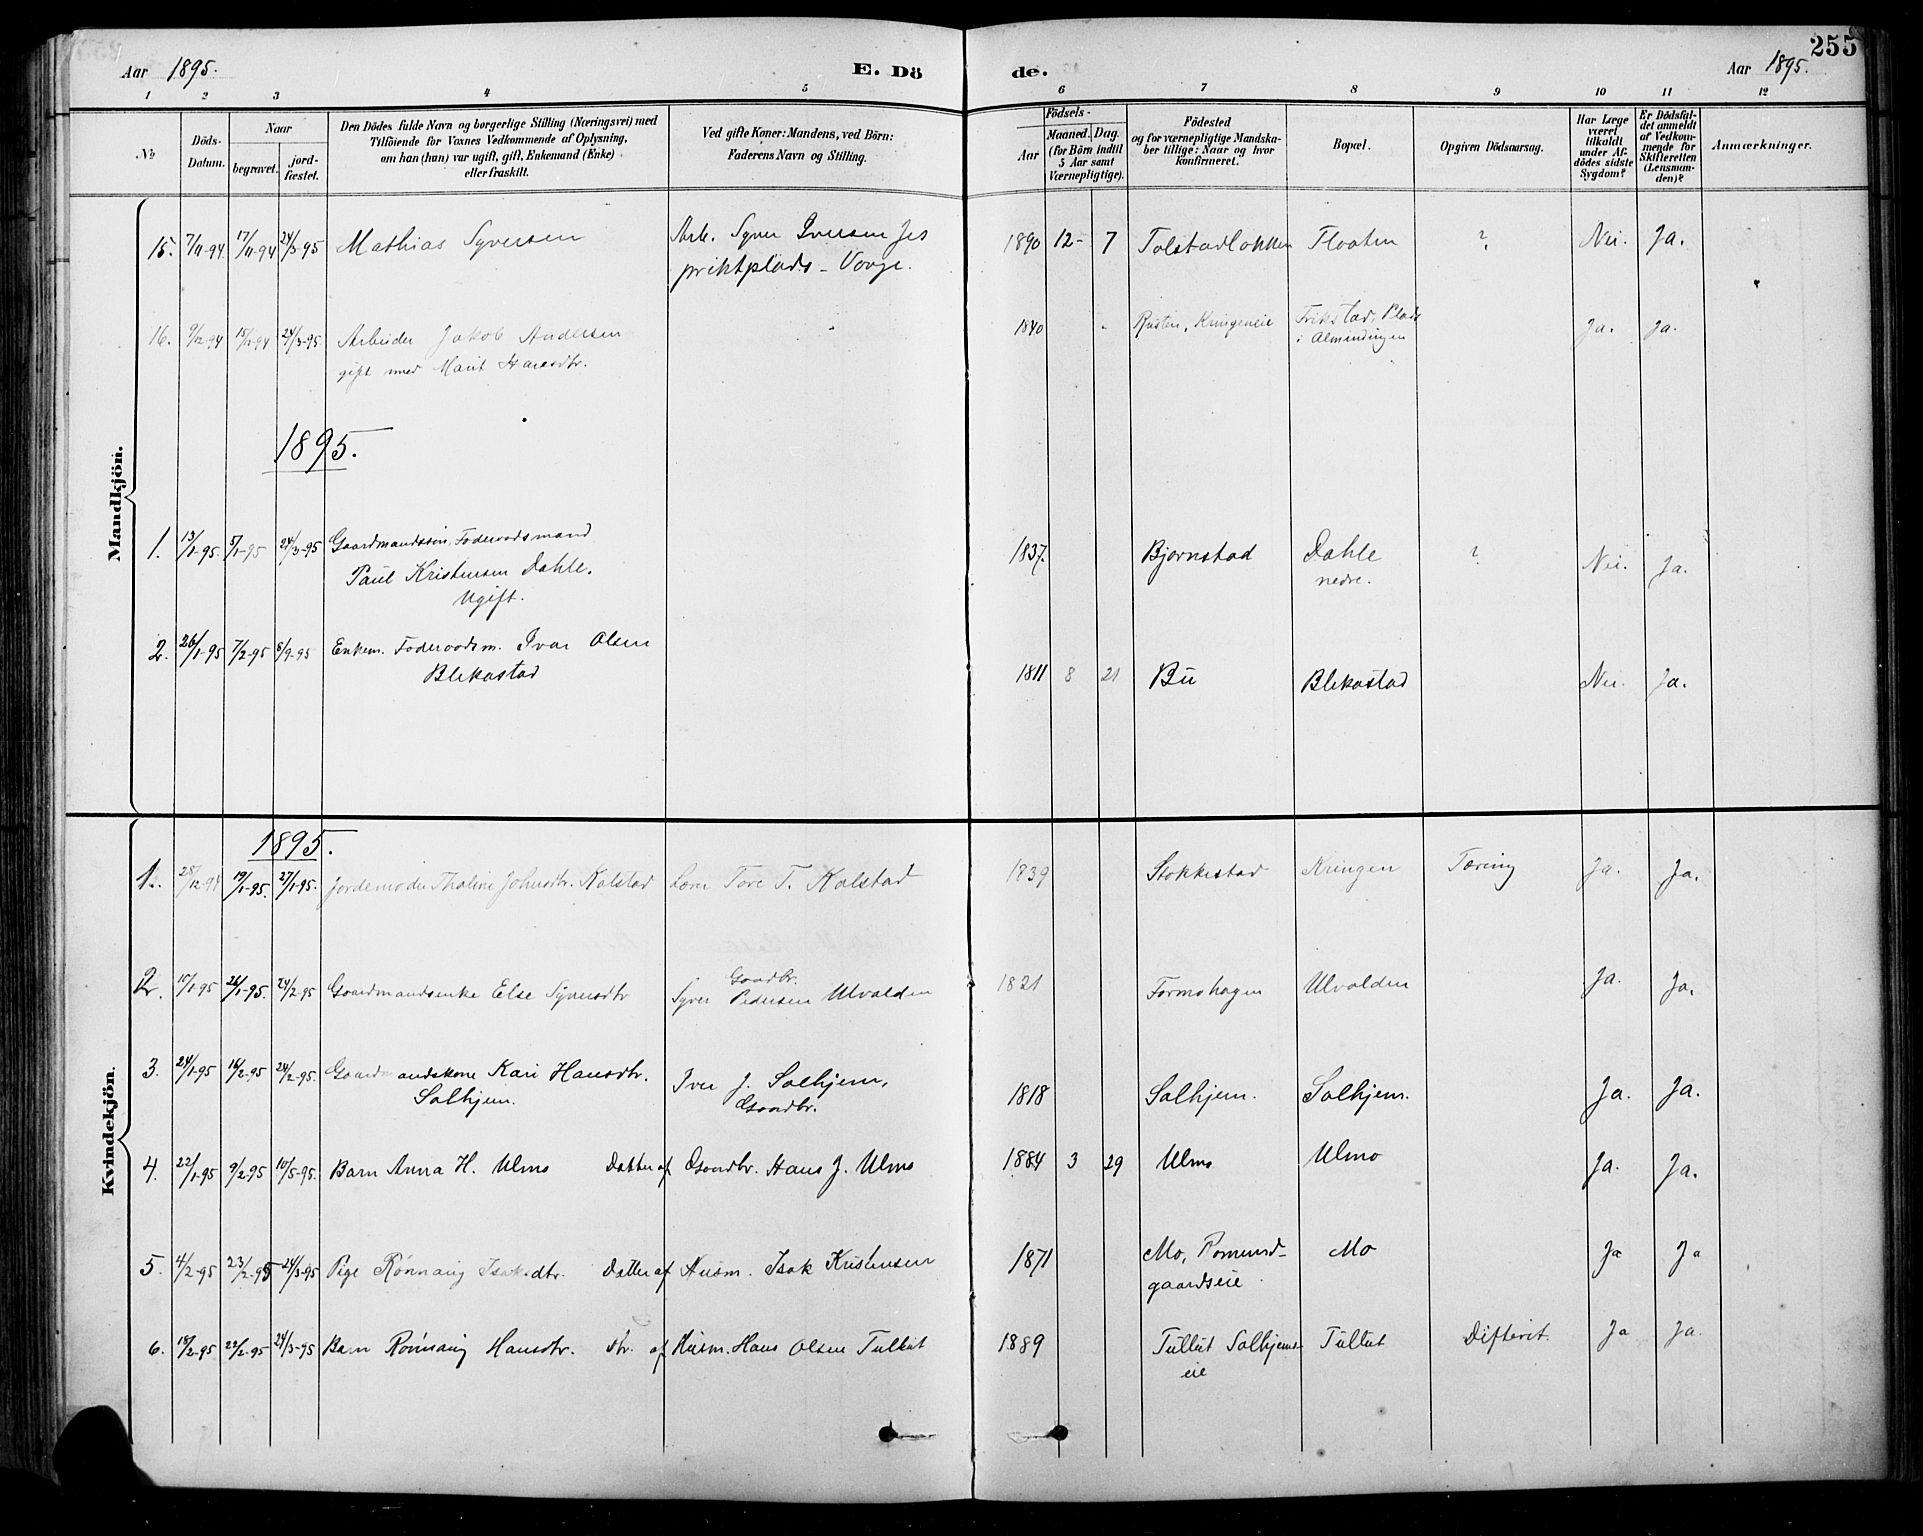 SAH, Sel prestekontor, Klokkerbok nr. 1, 1894-1923, s. 255